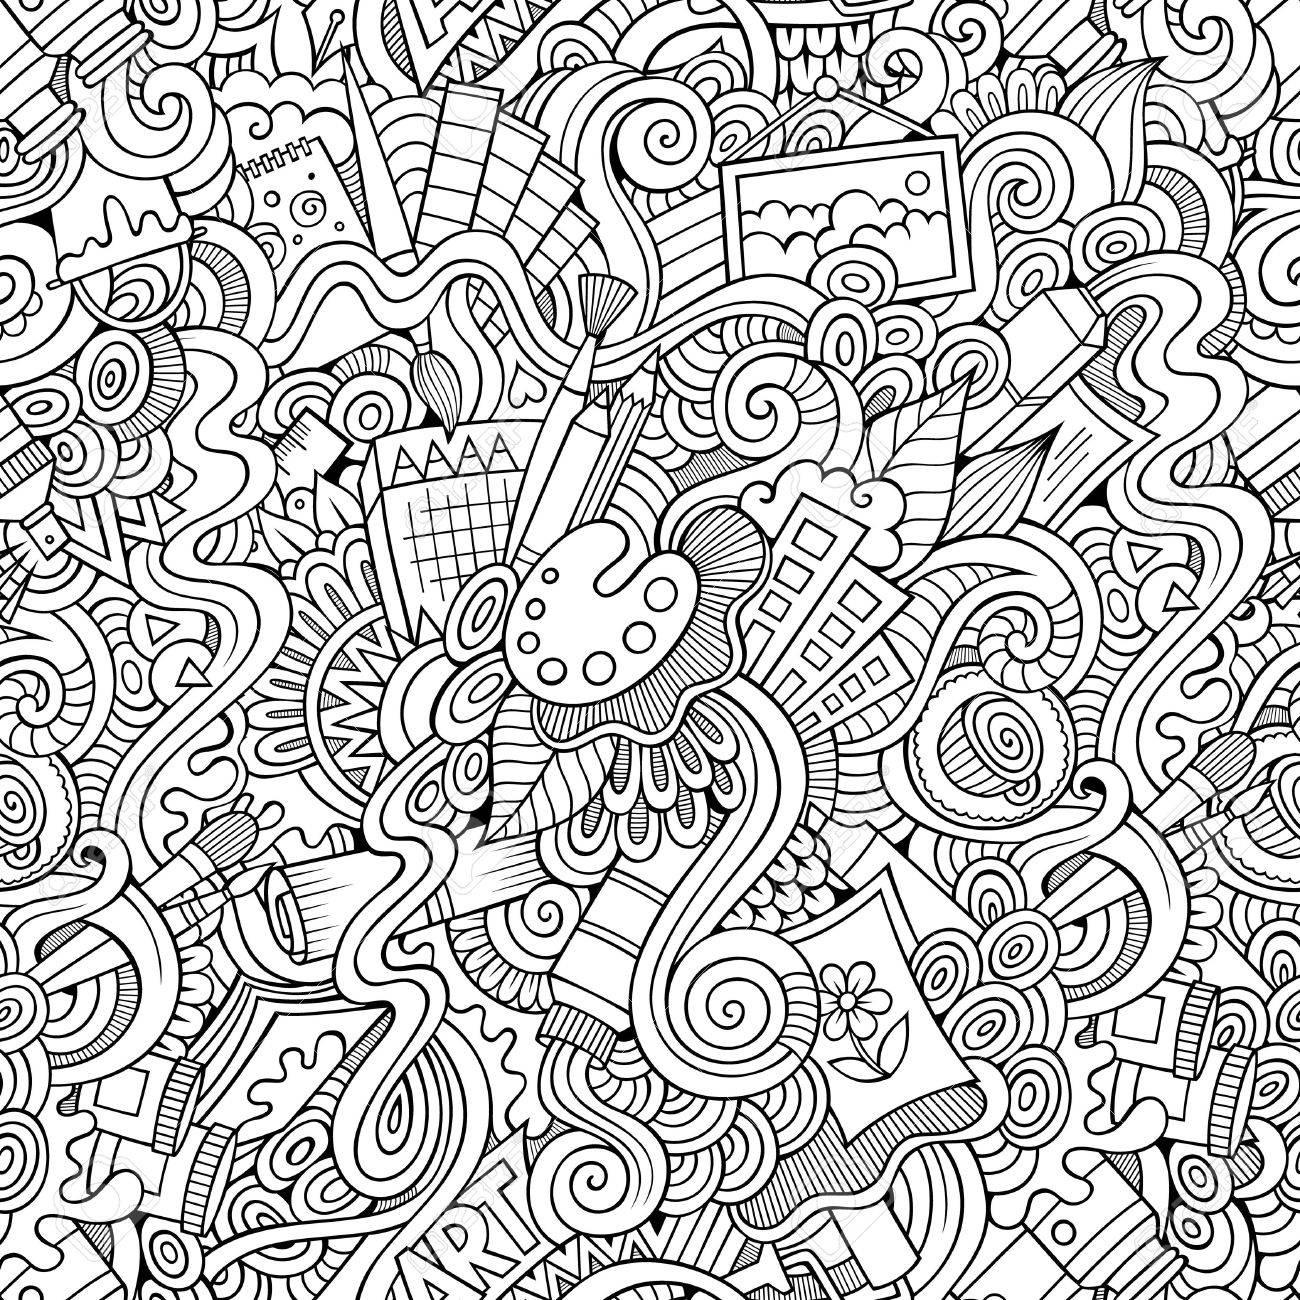 Cartoon vector doodles hand drawn art and craft seamless pattern - 40498384